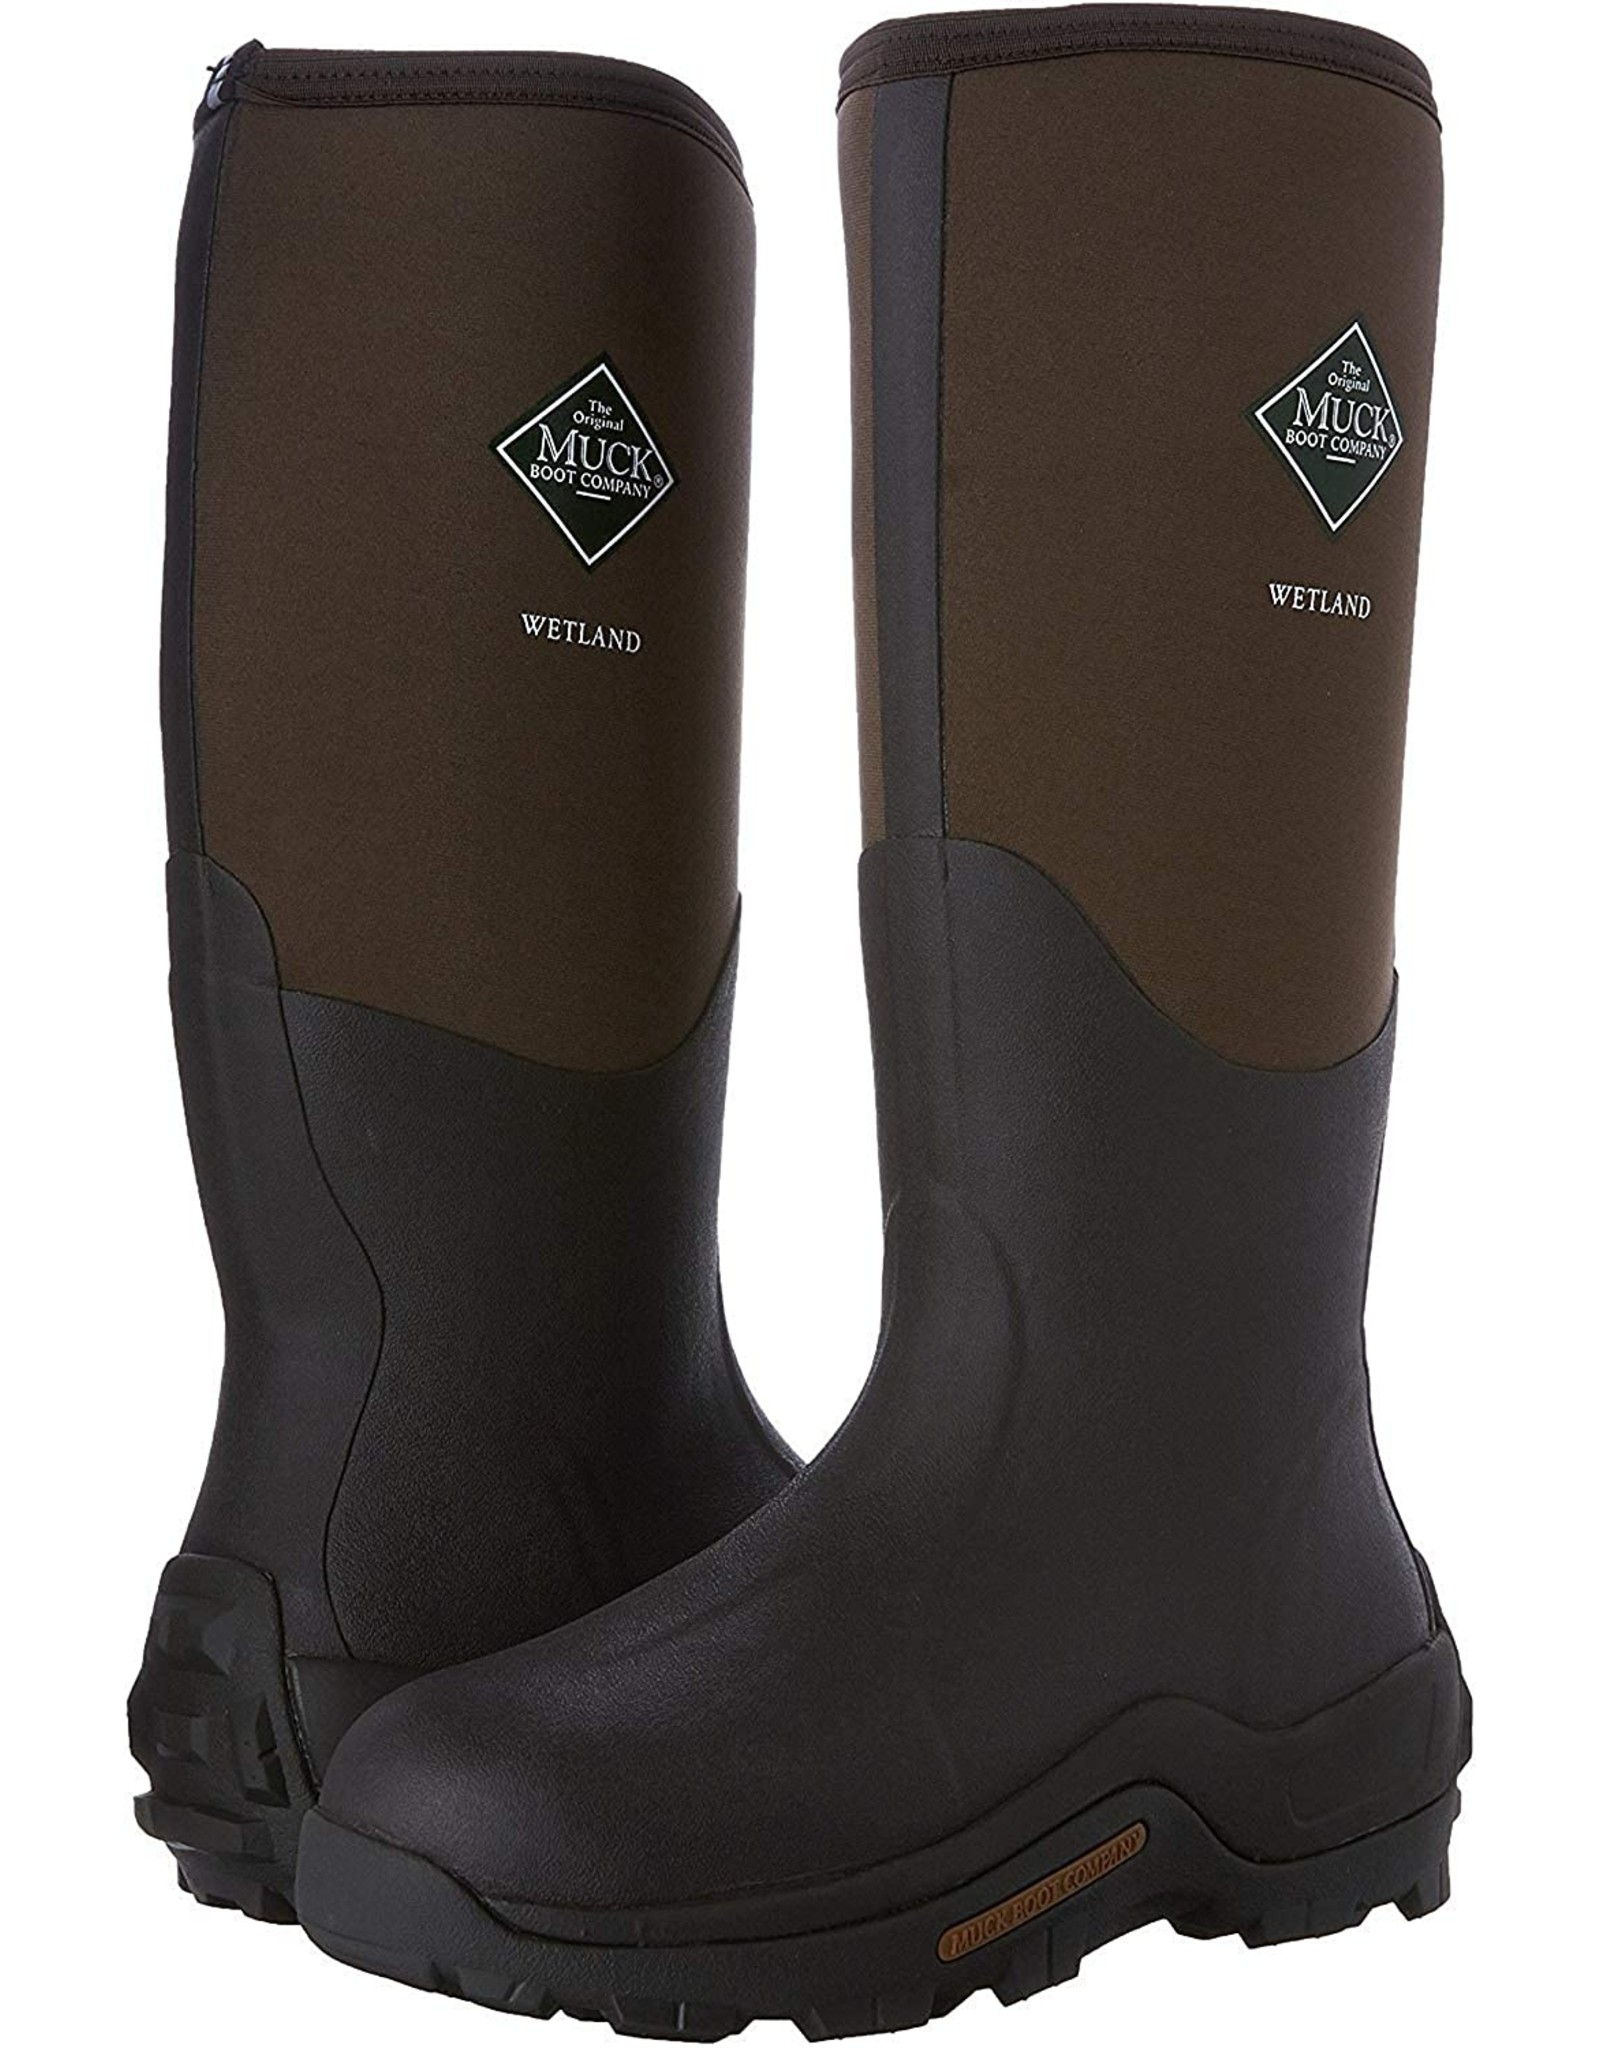 MUCK BOOT COMPANY Muck WetLand Boots